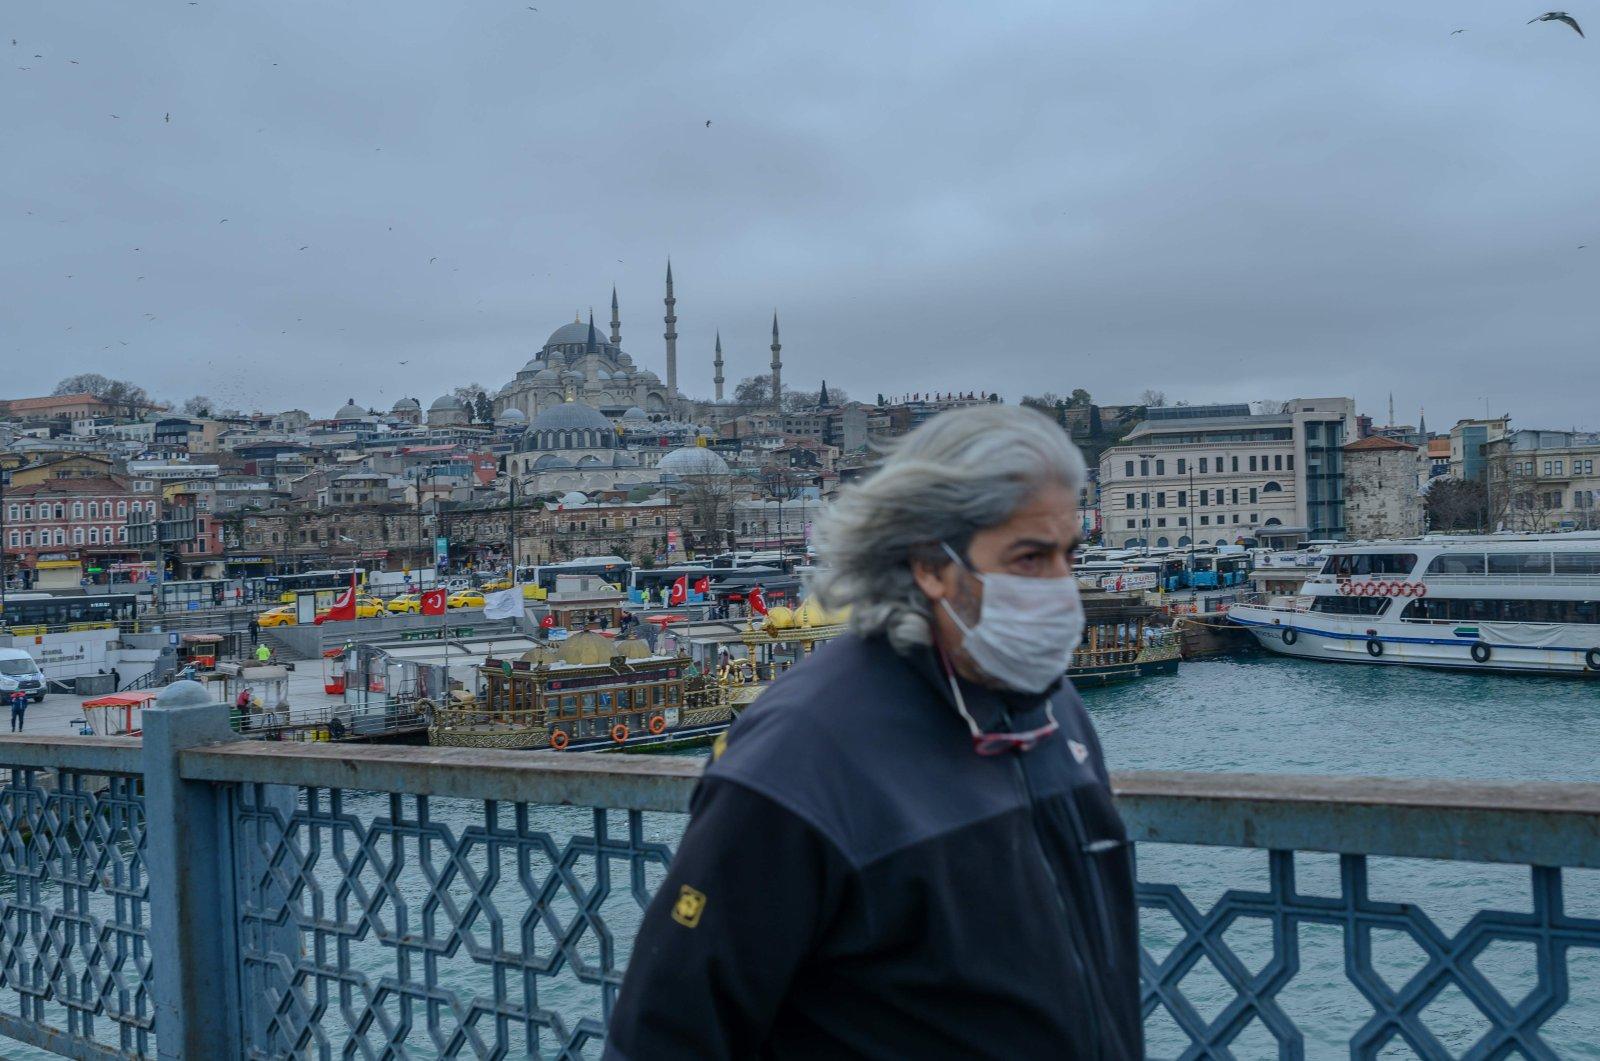 A man walks across Galata bridge in deserted central Istanbul amid coronavirus outbreak, Thursday, March 26, 2020. (AFP Photo)